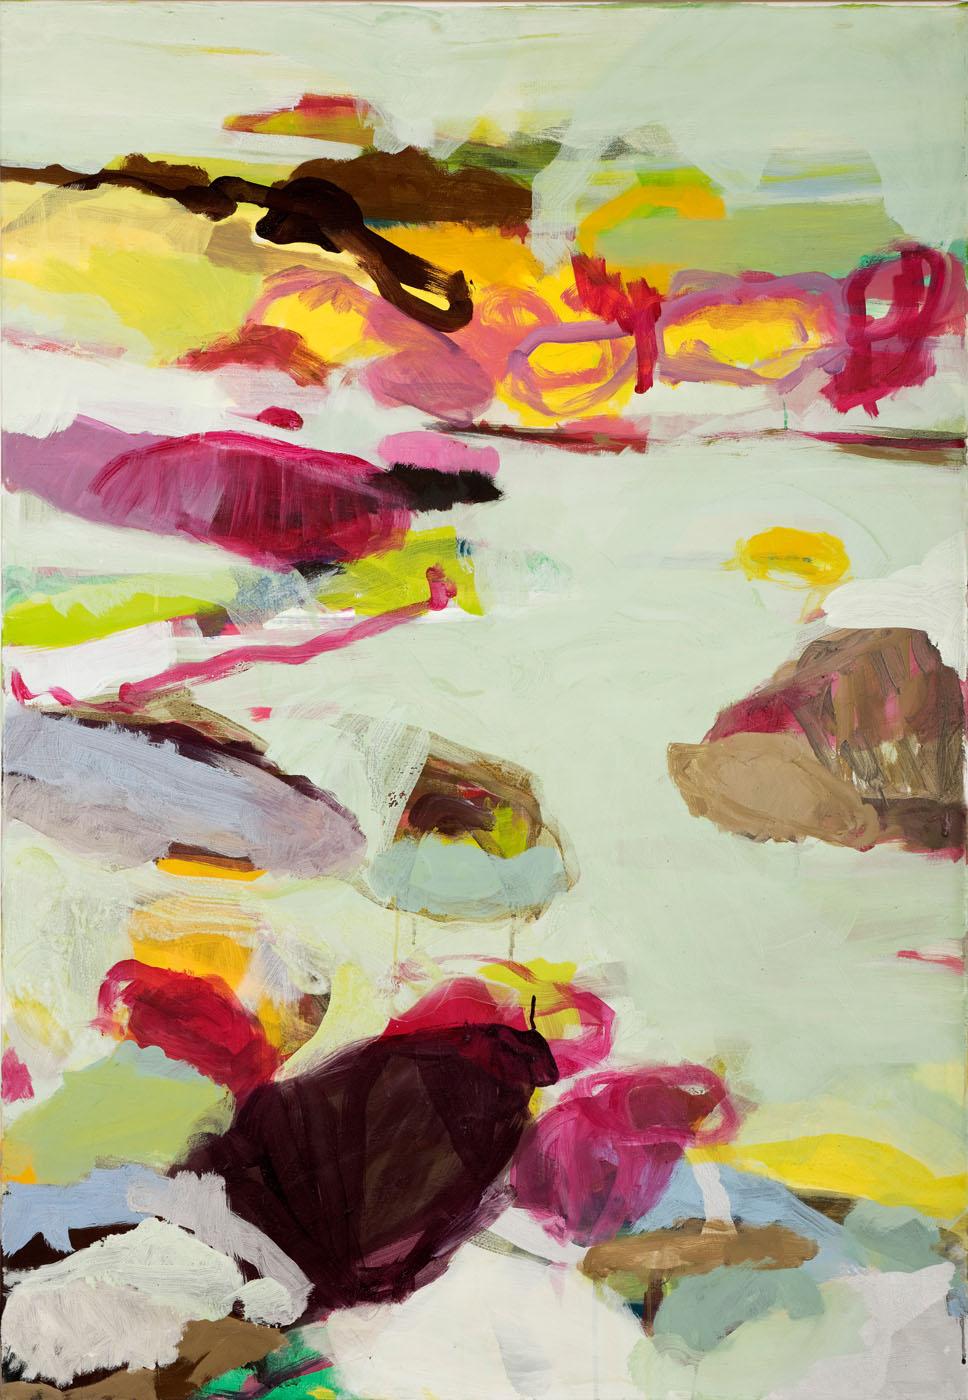 Grünes Land II, 2010. Acryl, 90 x 130cm